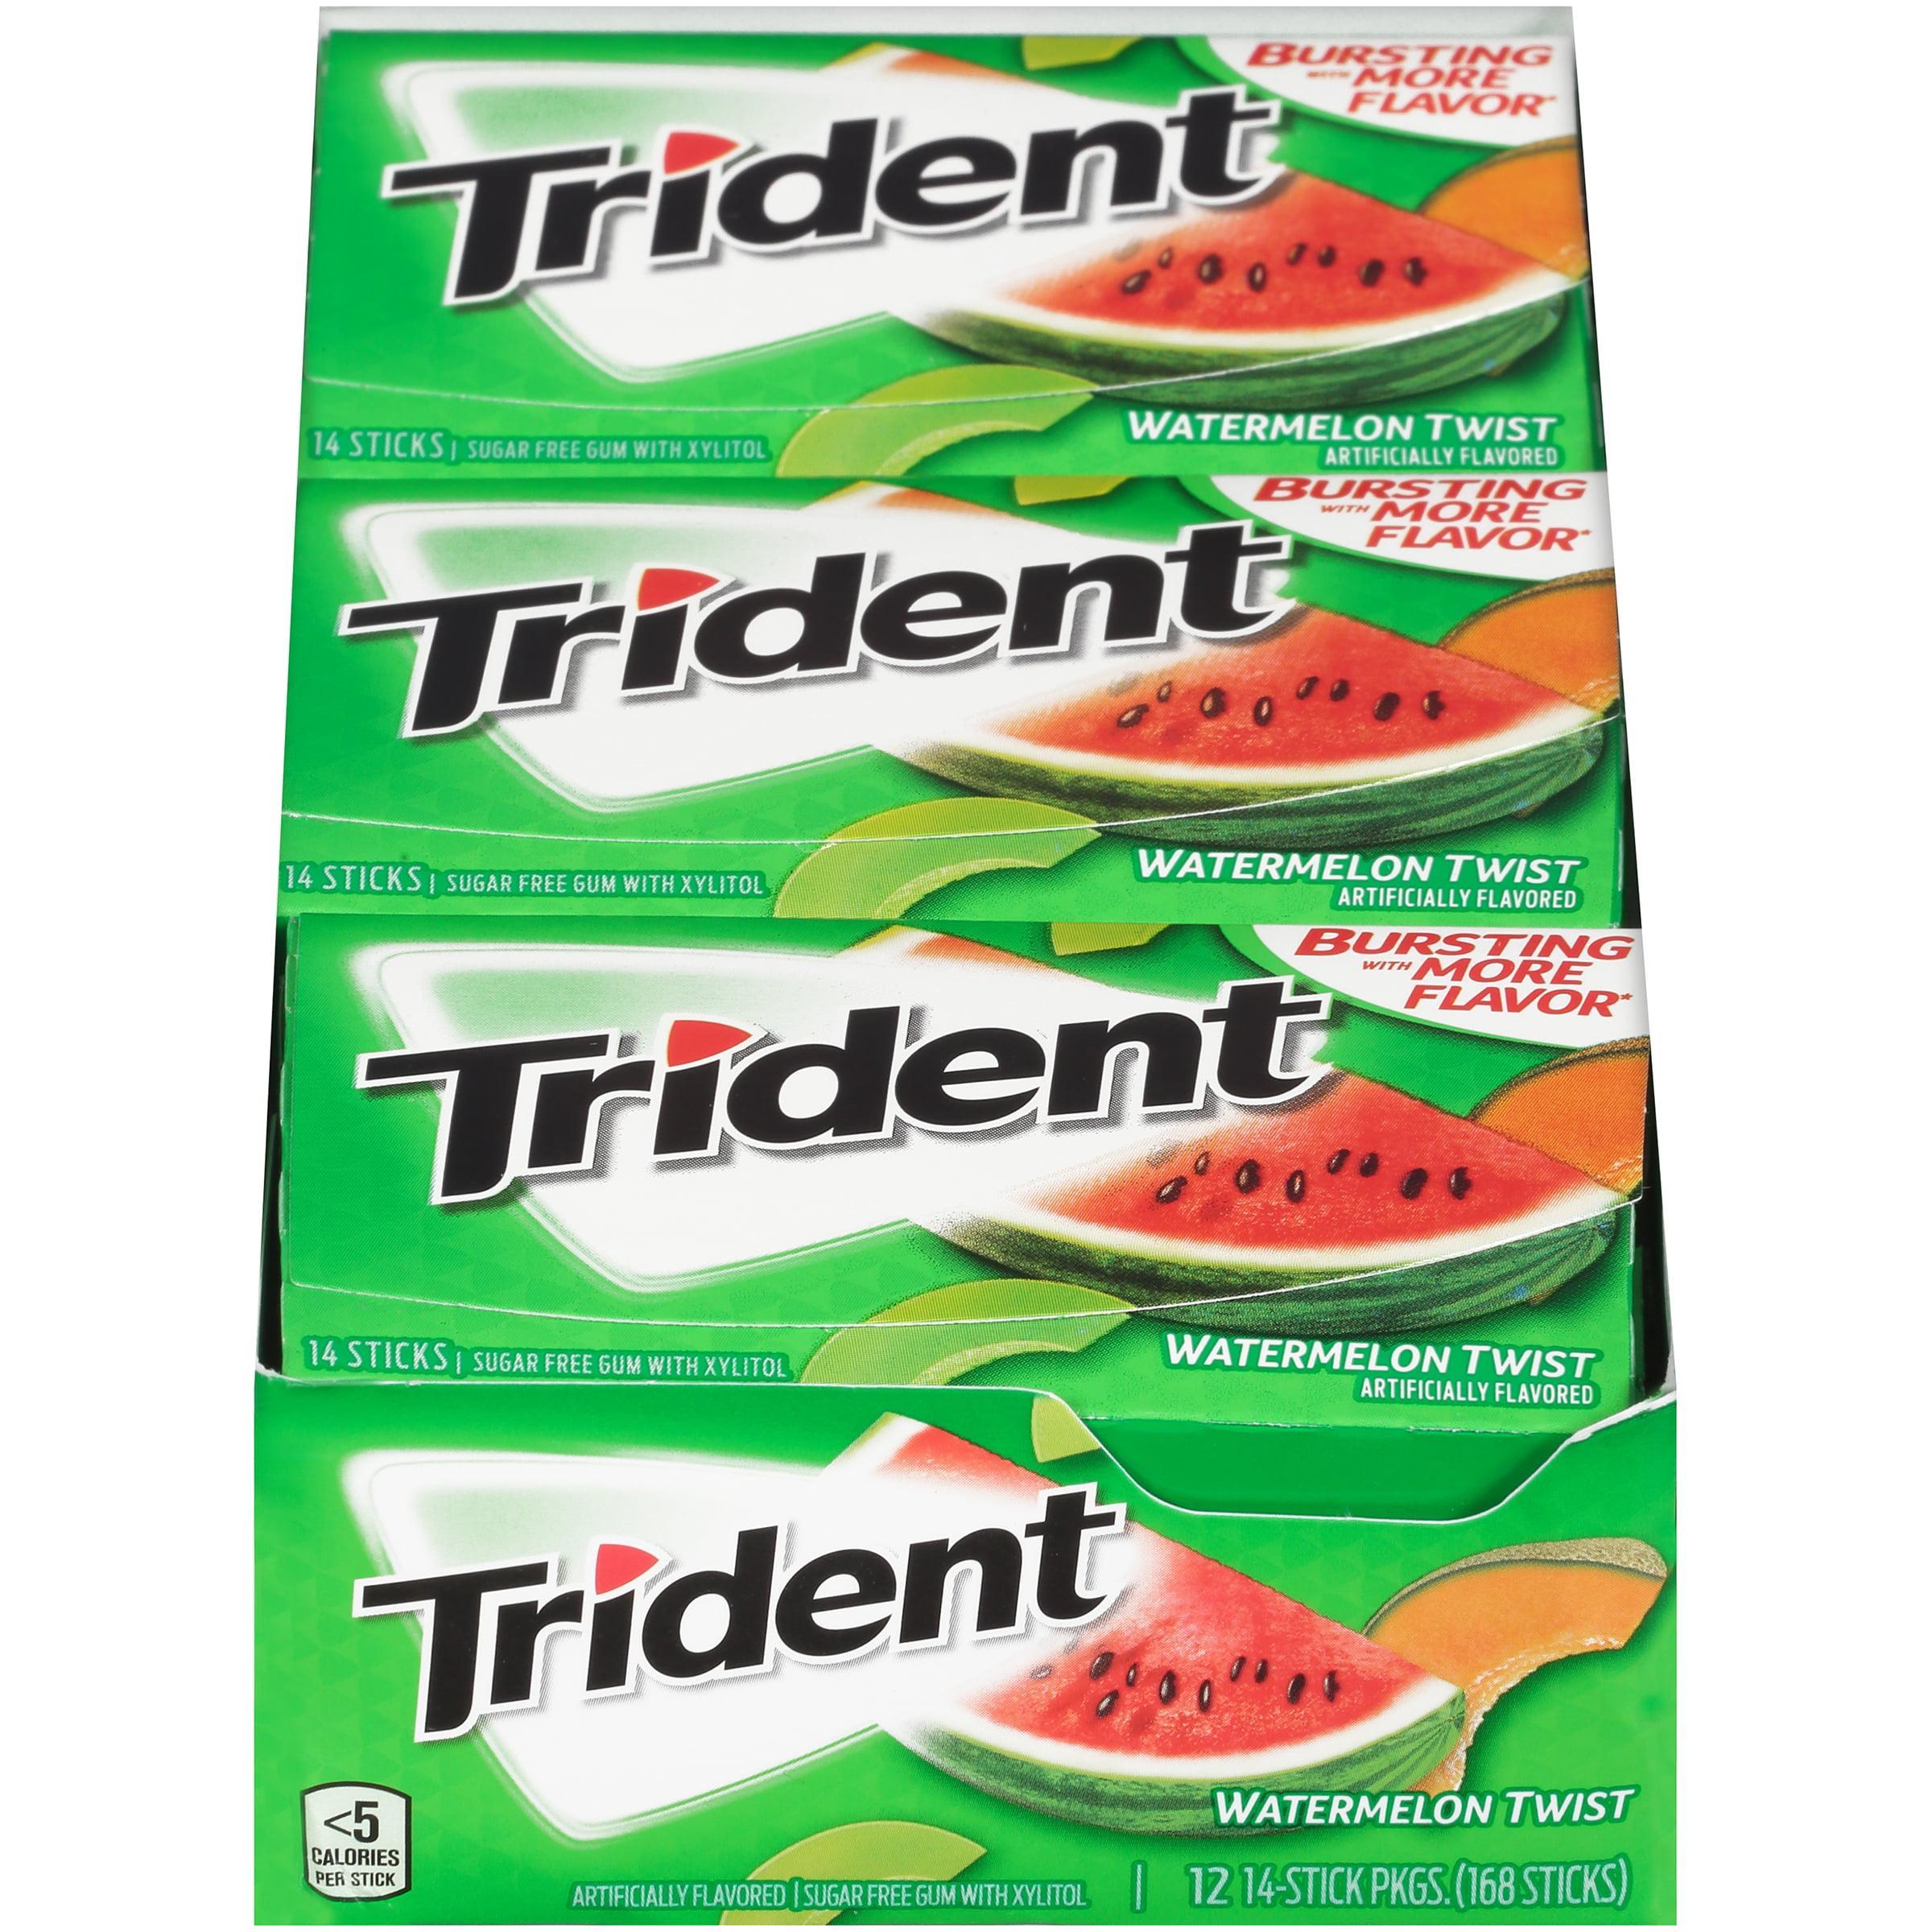 Trident, Sugar Free Watermelong Twist Chewing Gum, 14 Pcs, 12 Ct